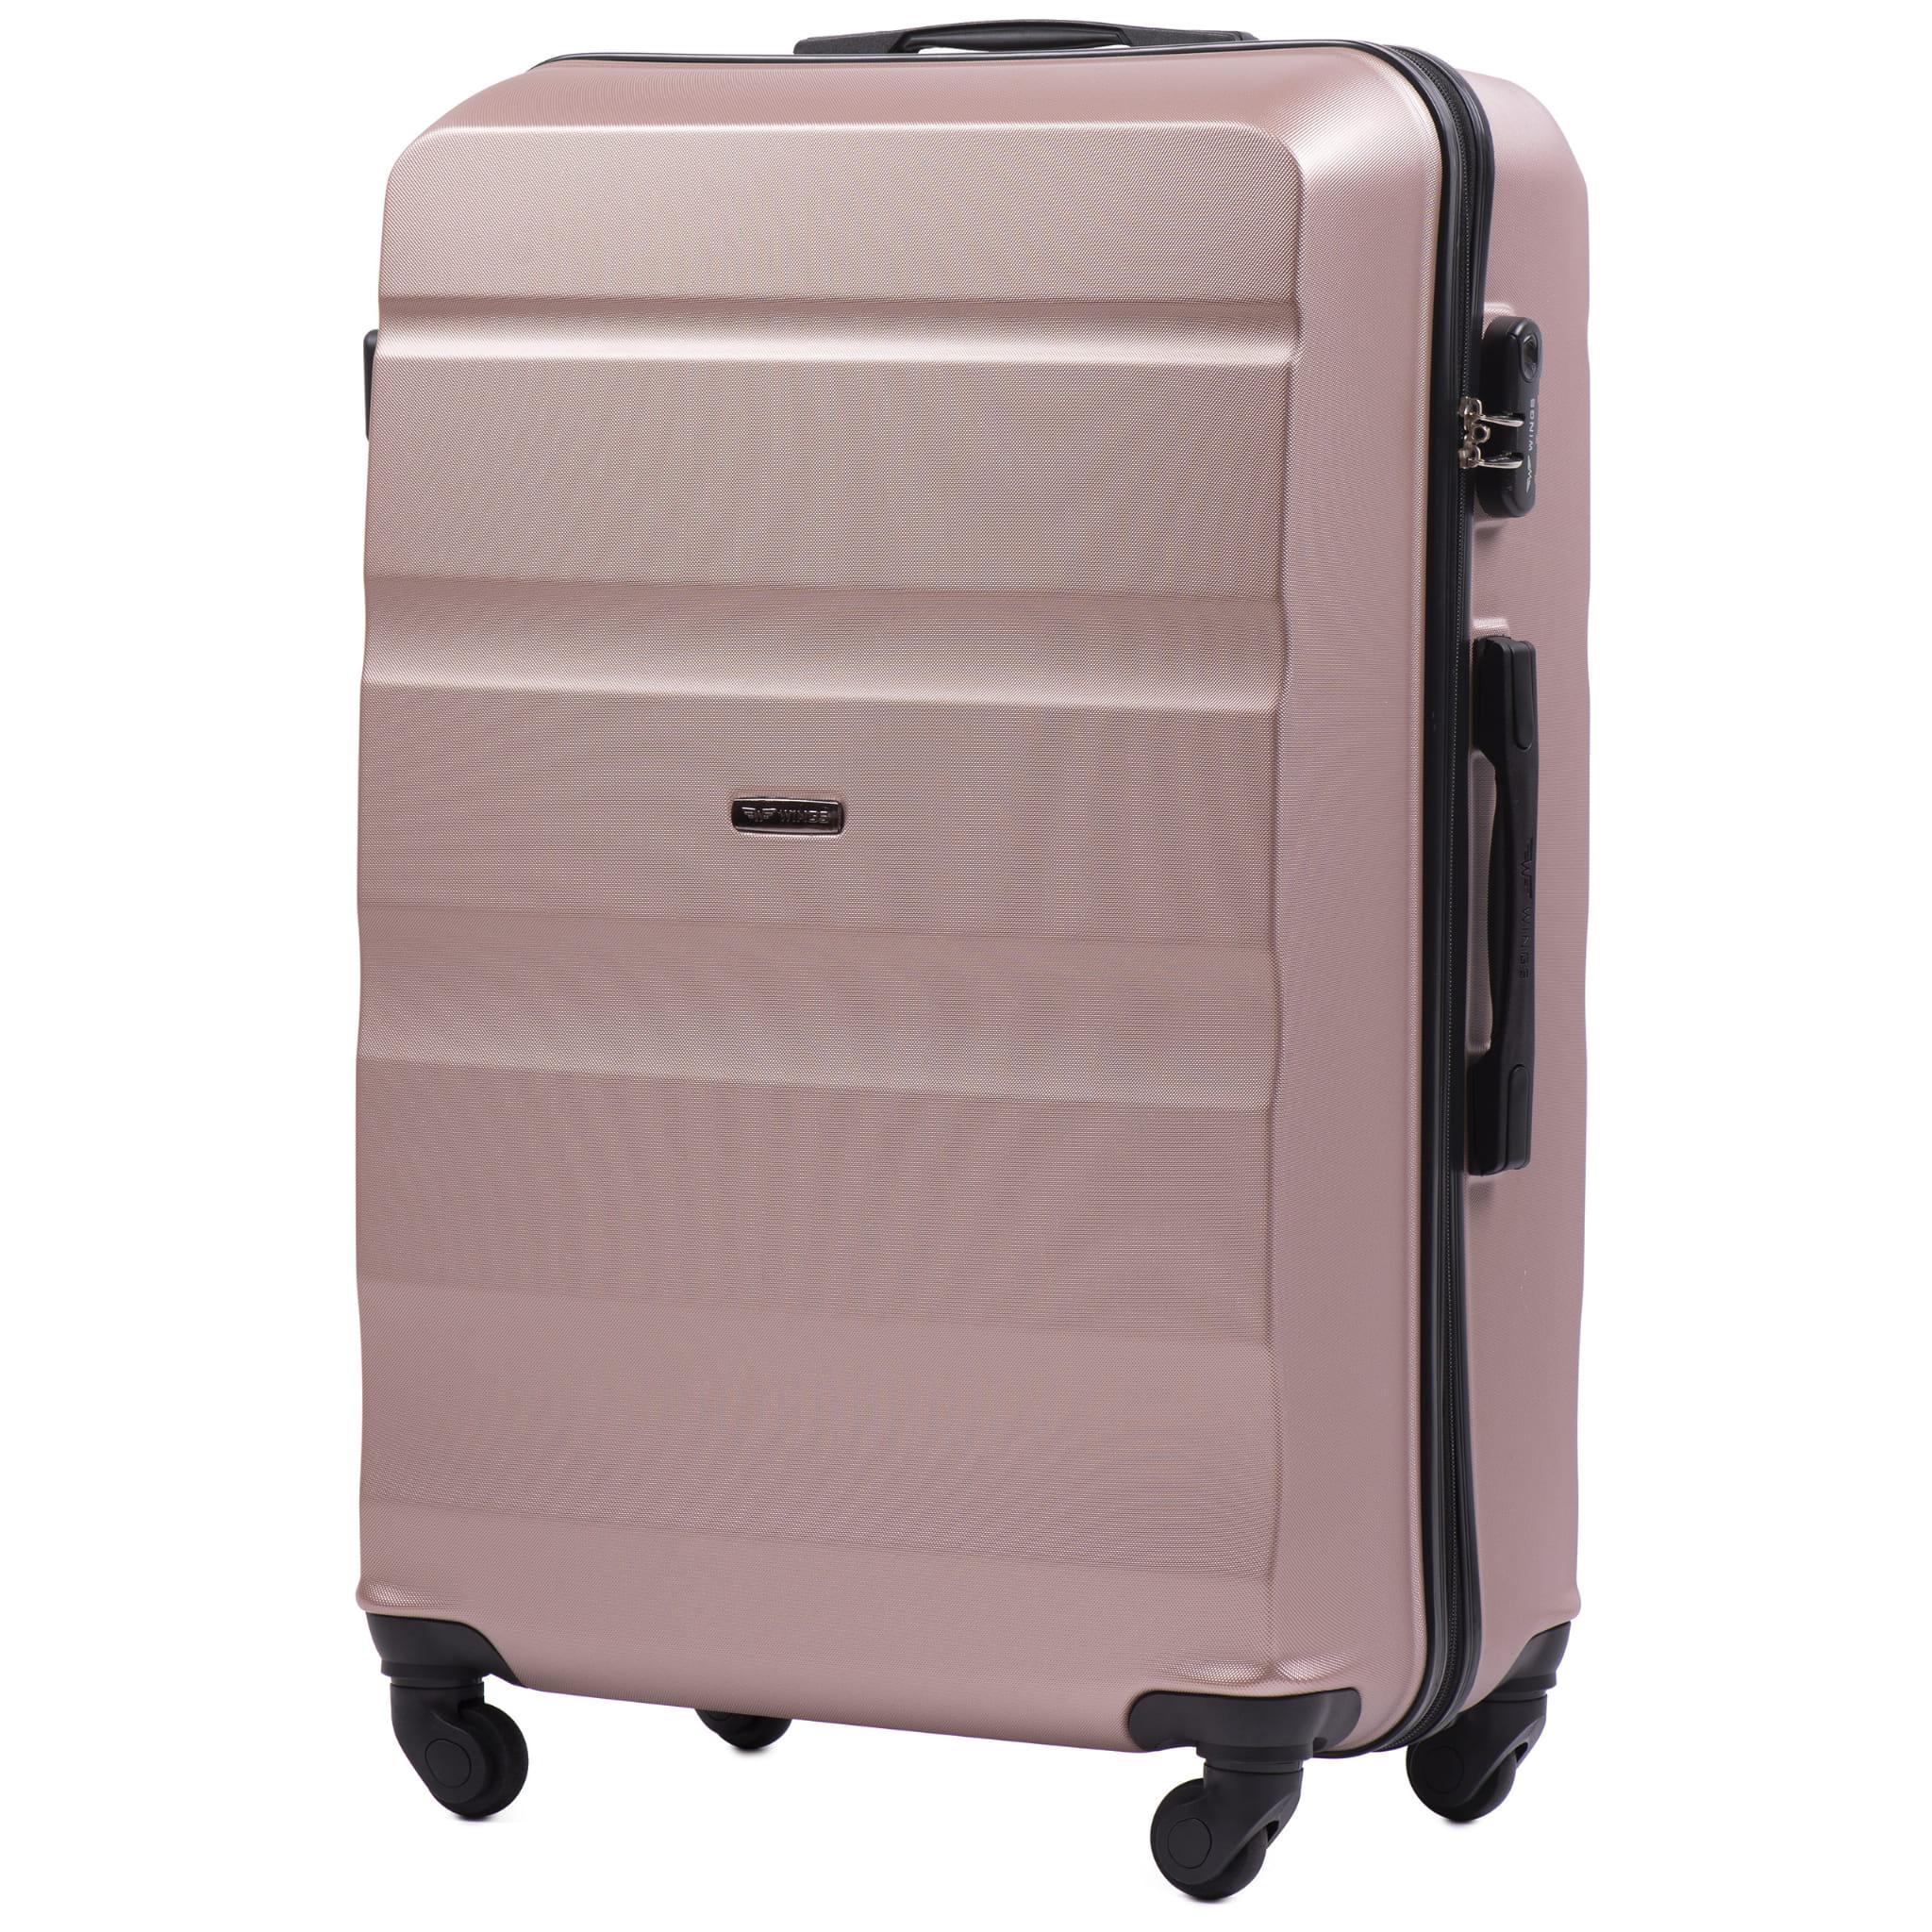 БОЛЬШОЙ ЧЕМОДАН WINGS AT01 L ROSE GOLD PREMIUM НА 4-Х КАУЧУКОВЫХ КОЛЕСАХ! Для багажа ,до 23 кг